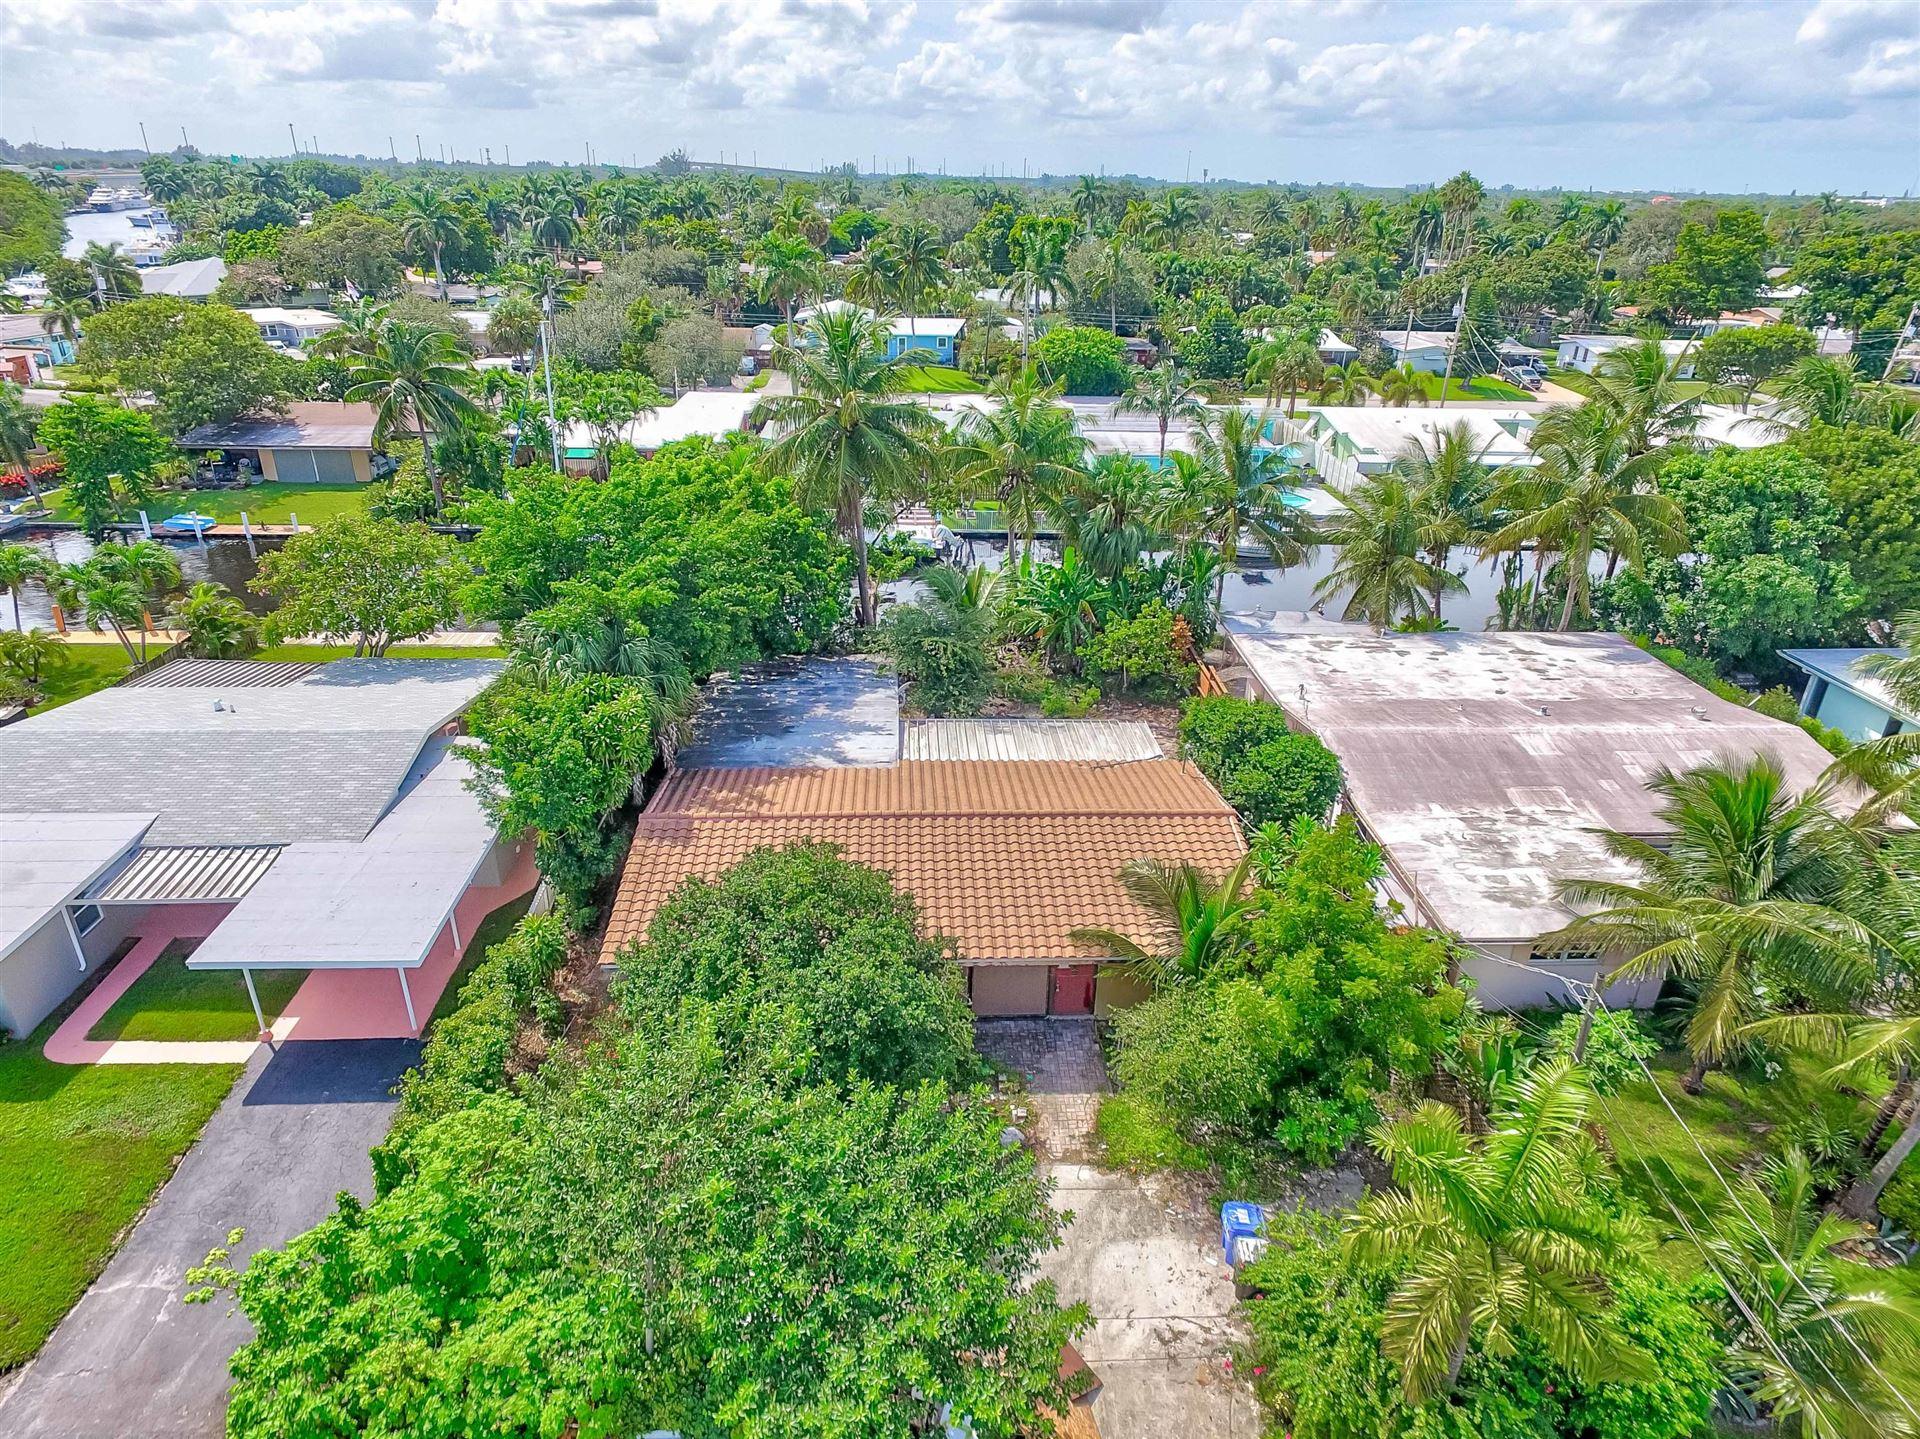 2507 Bimini Lane, Fort Lauderdale, FL 33312 - #: RX-10658959